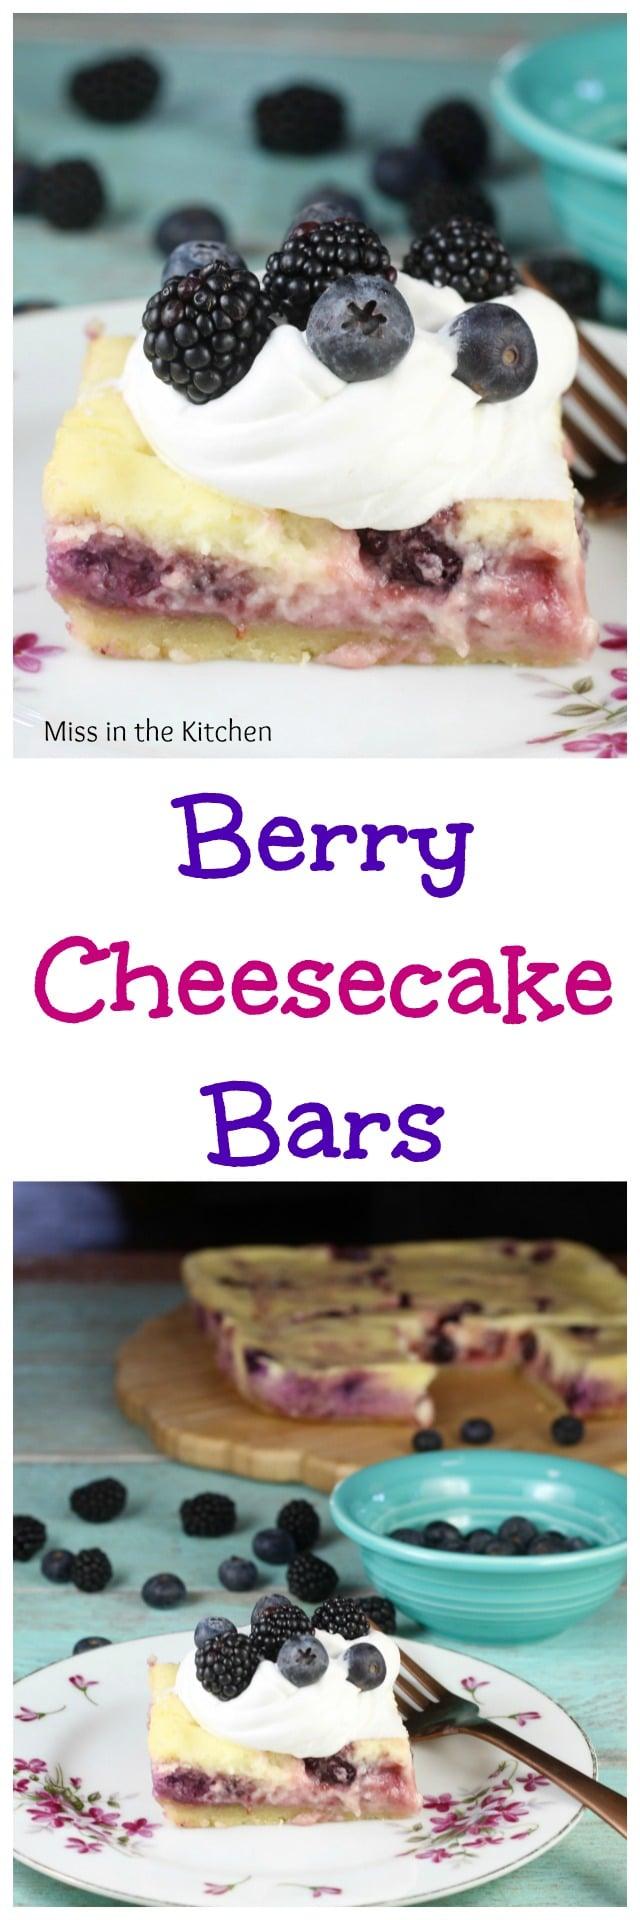 Berry Cheesecake Bars ~ Easy Dessert Recipe from MissintheKitchen.com